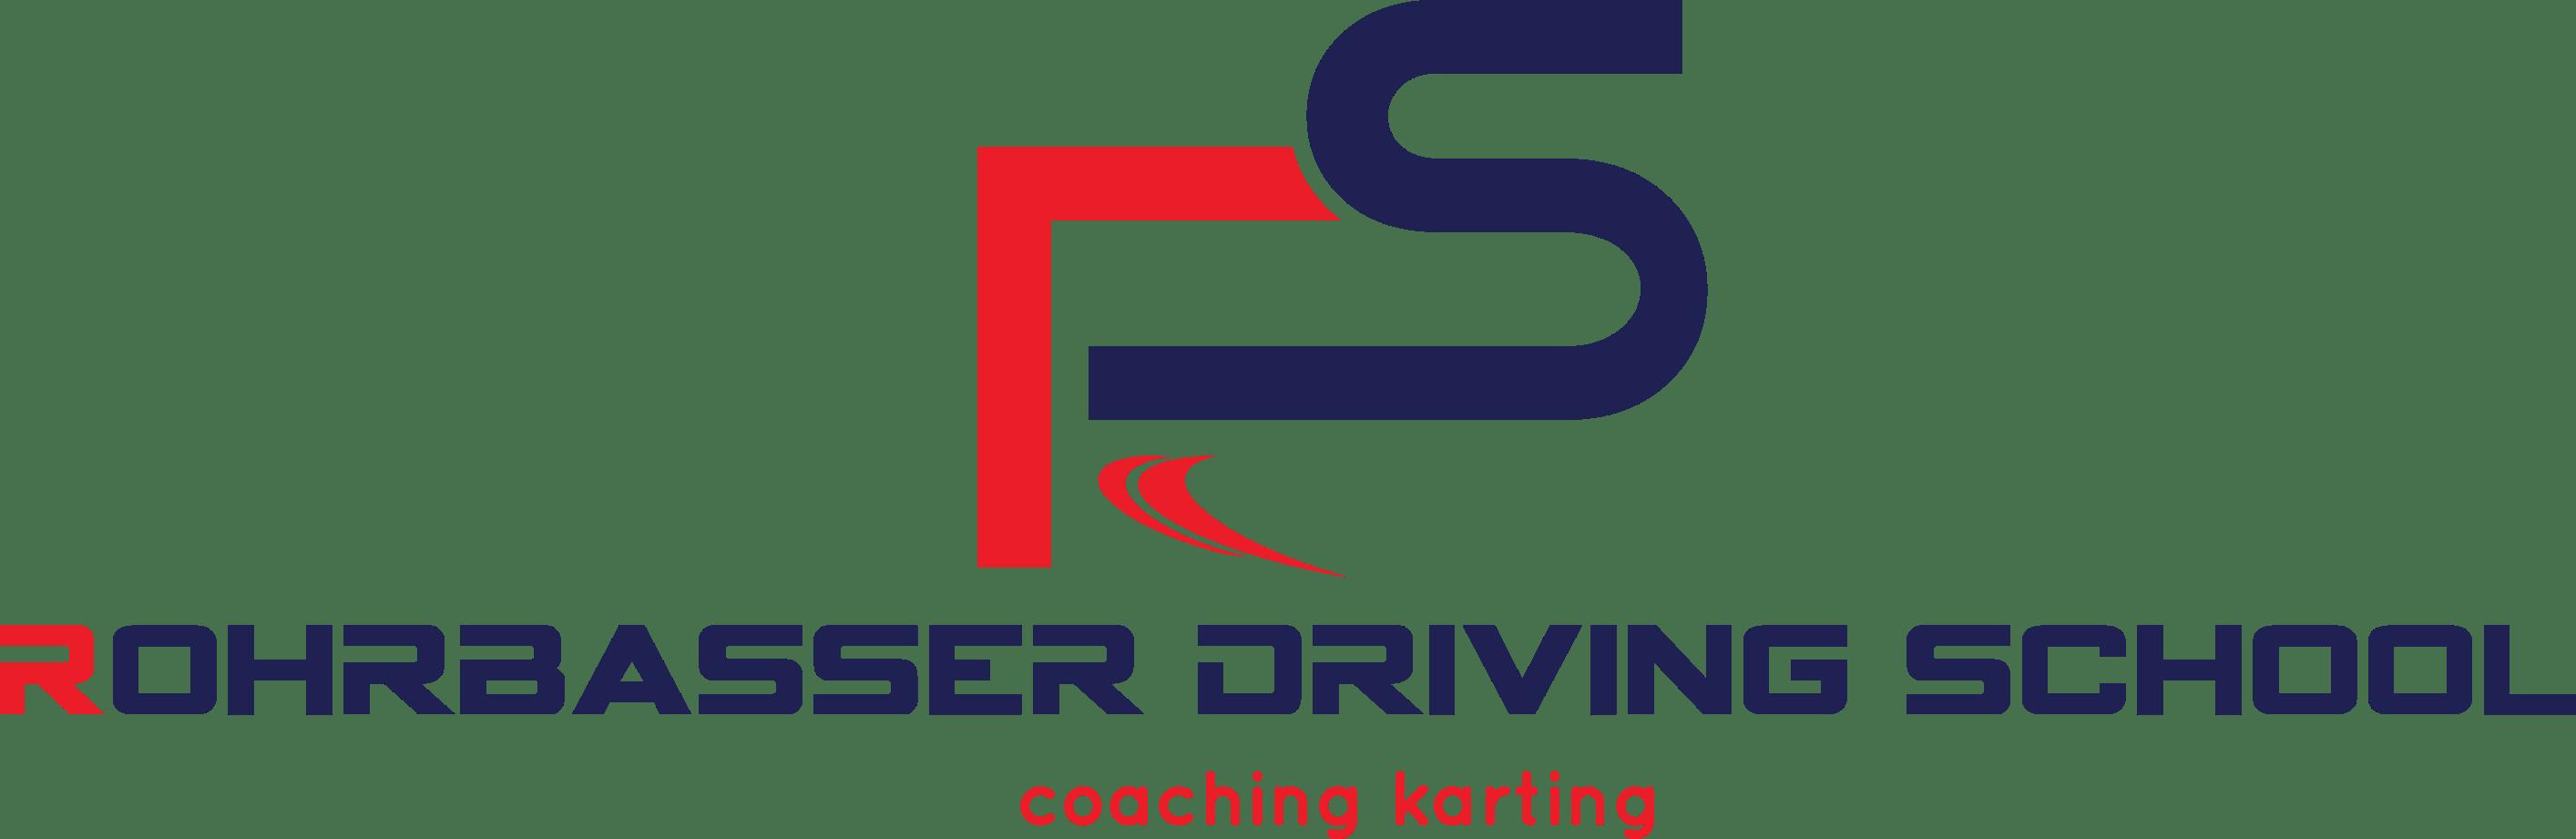 Rohrbasser Driving School - coaching karting - logo